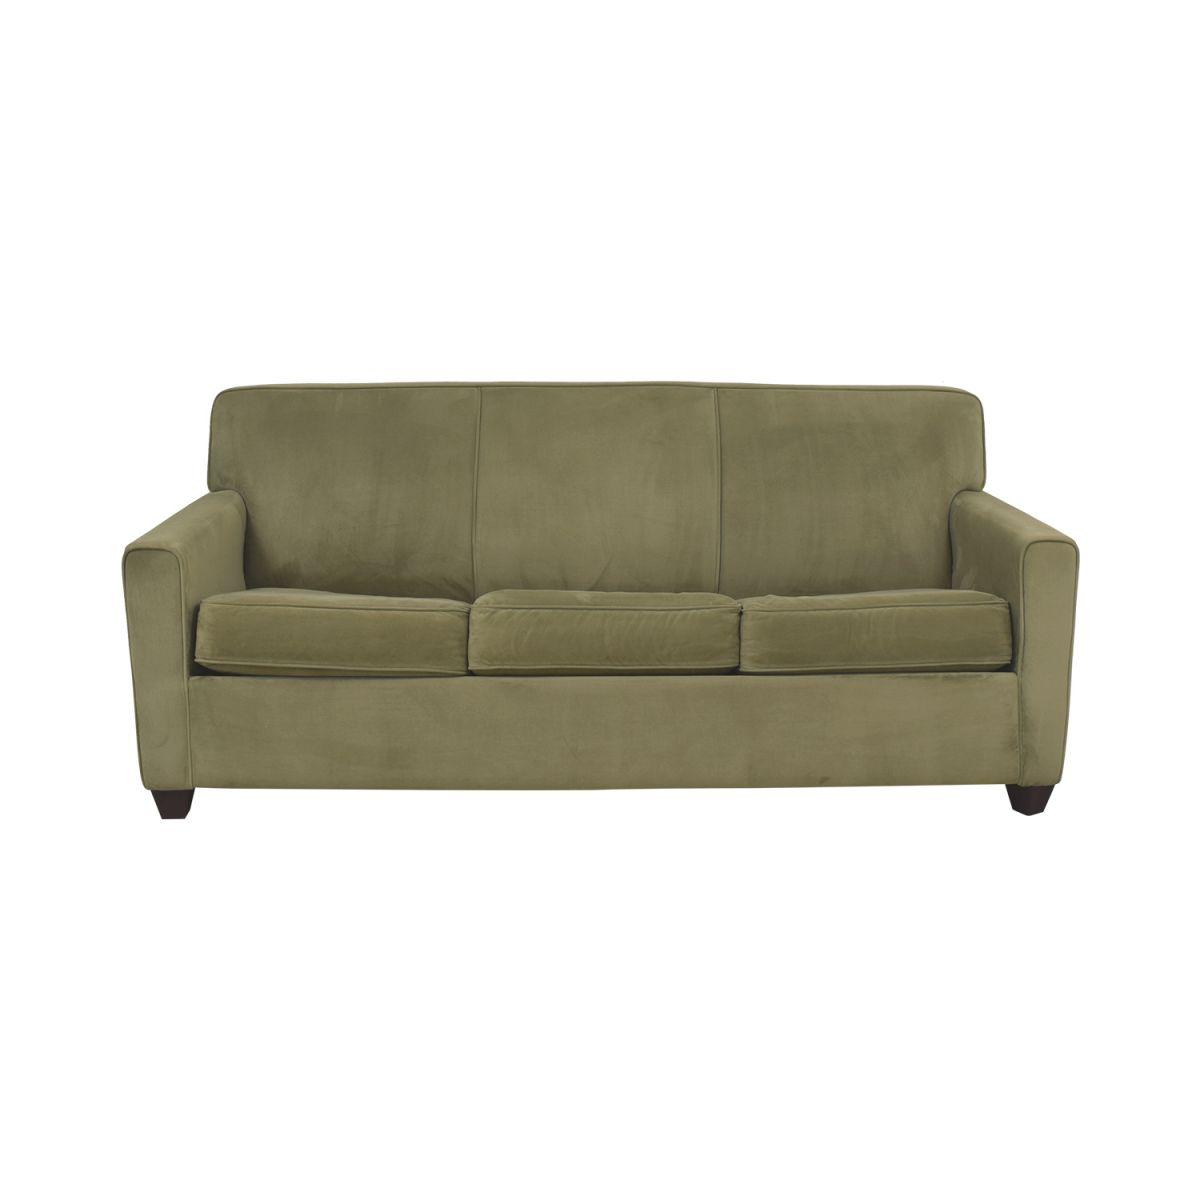 80% Off - Raymour & Flanigan Raymour & Flanigan Queen Sleeper Sofa / Sofas regarding Lovely Raymour And Flanigan Sleeper Sofa